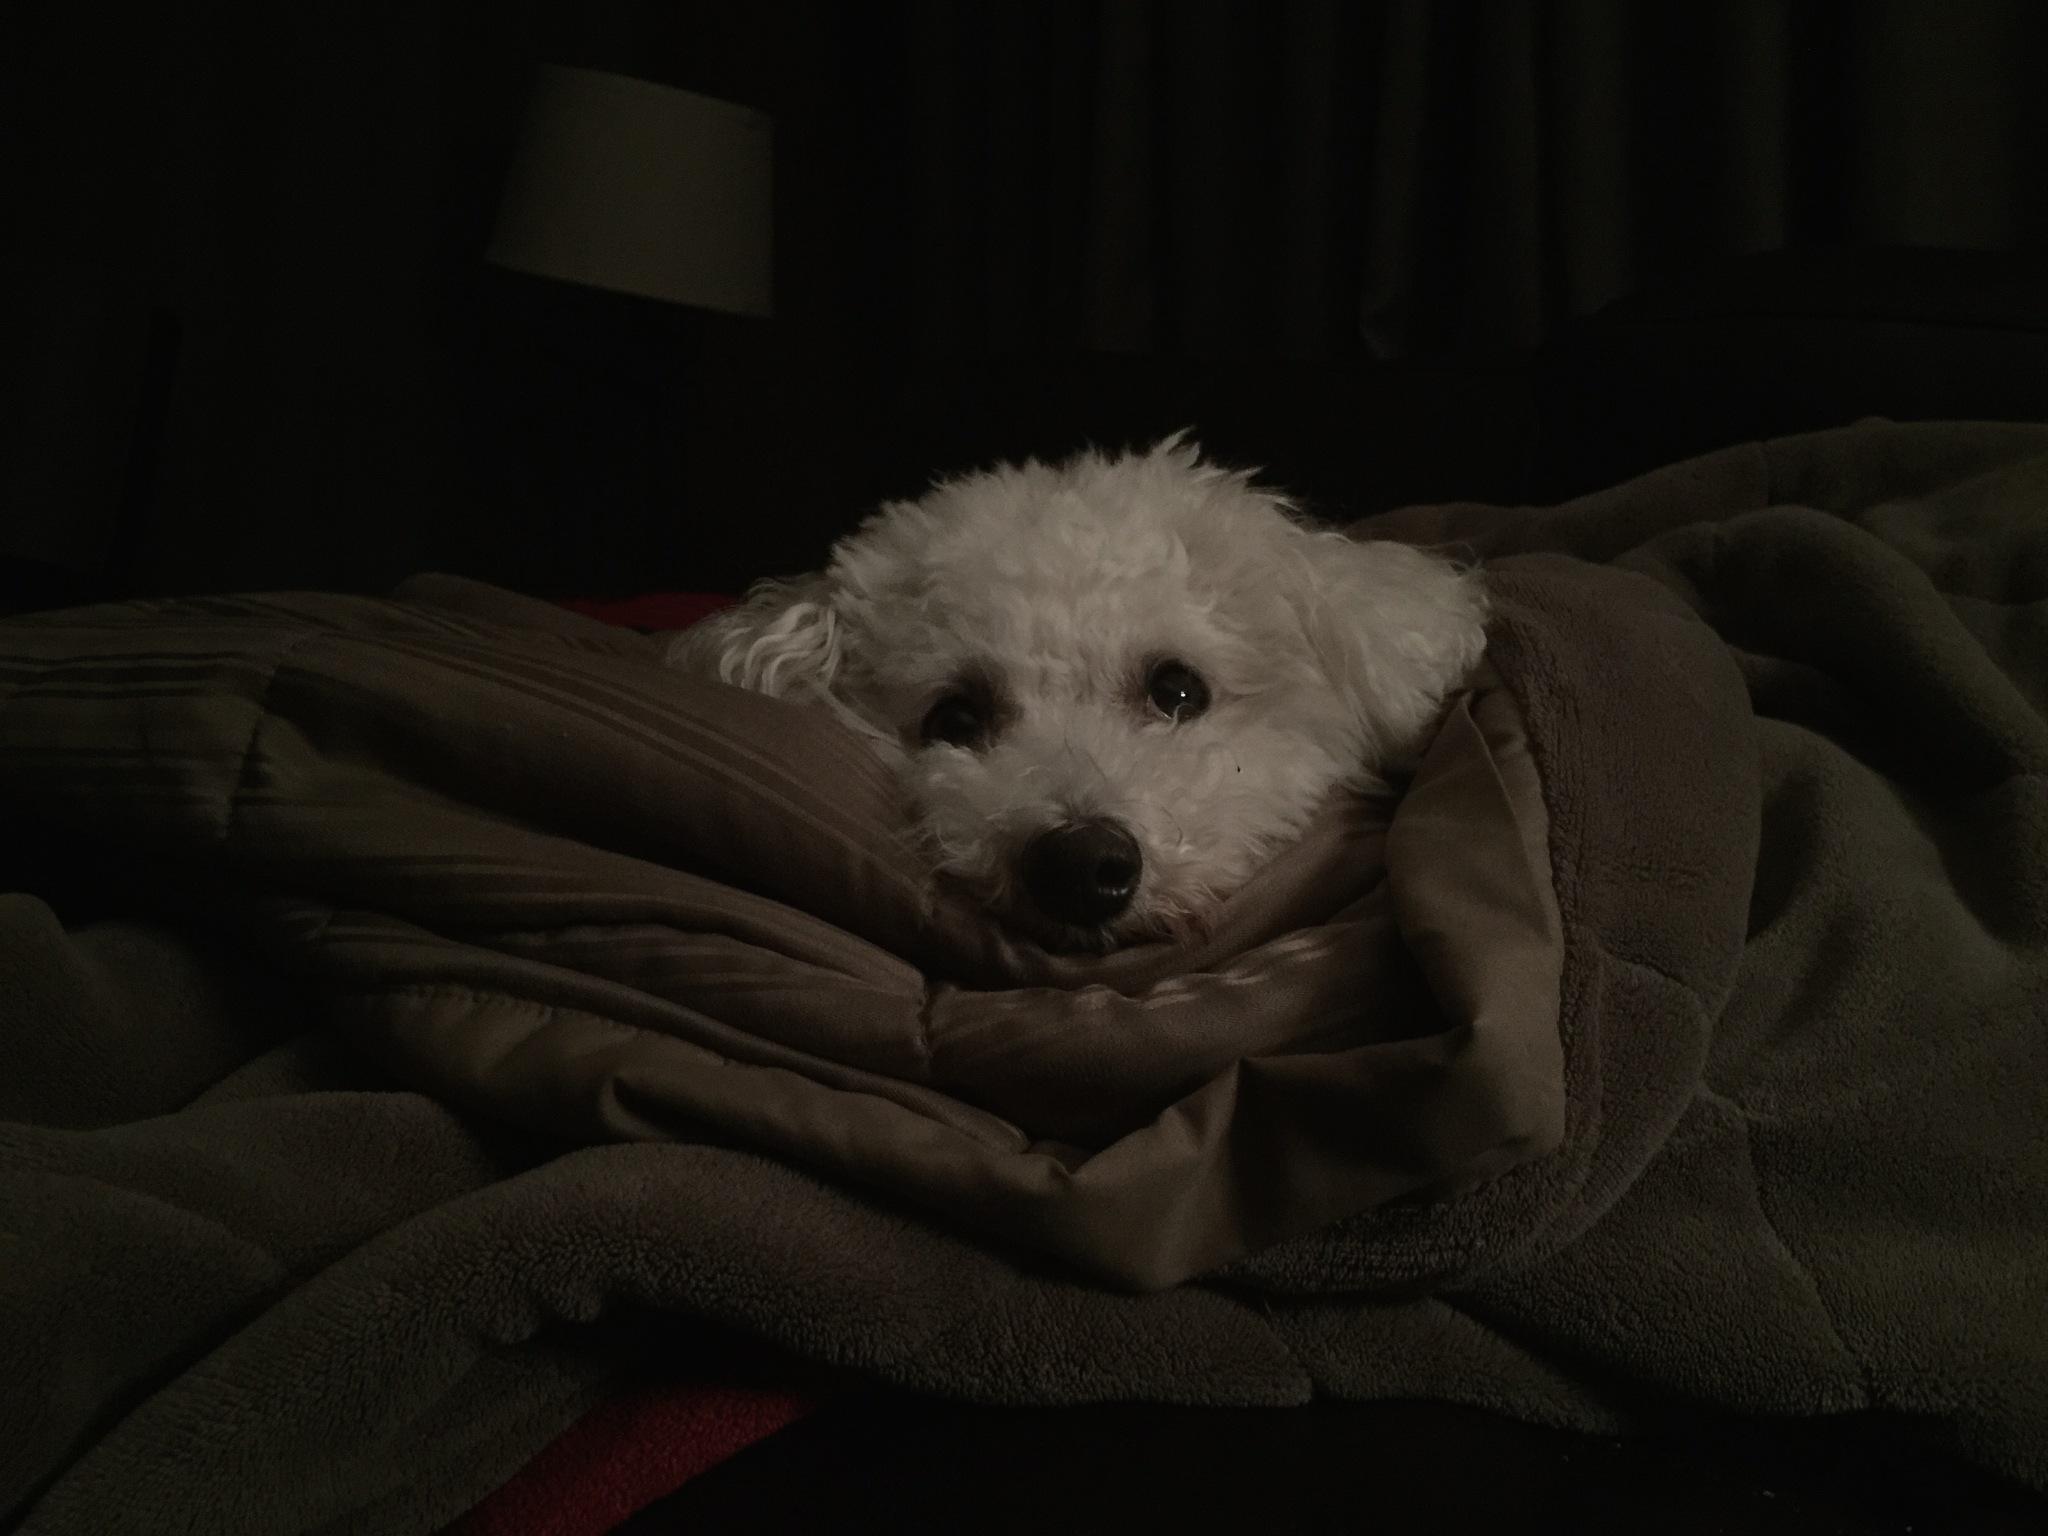 Dog in a blanket by Lawrence Splitter